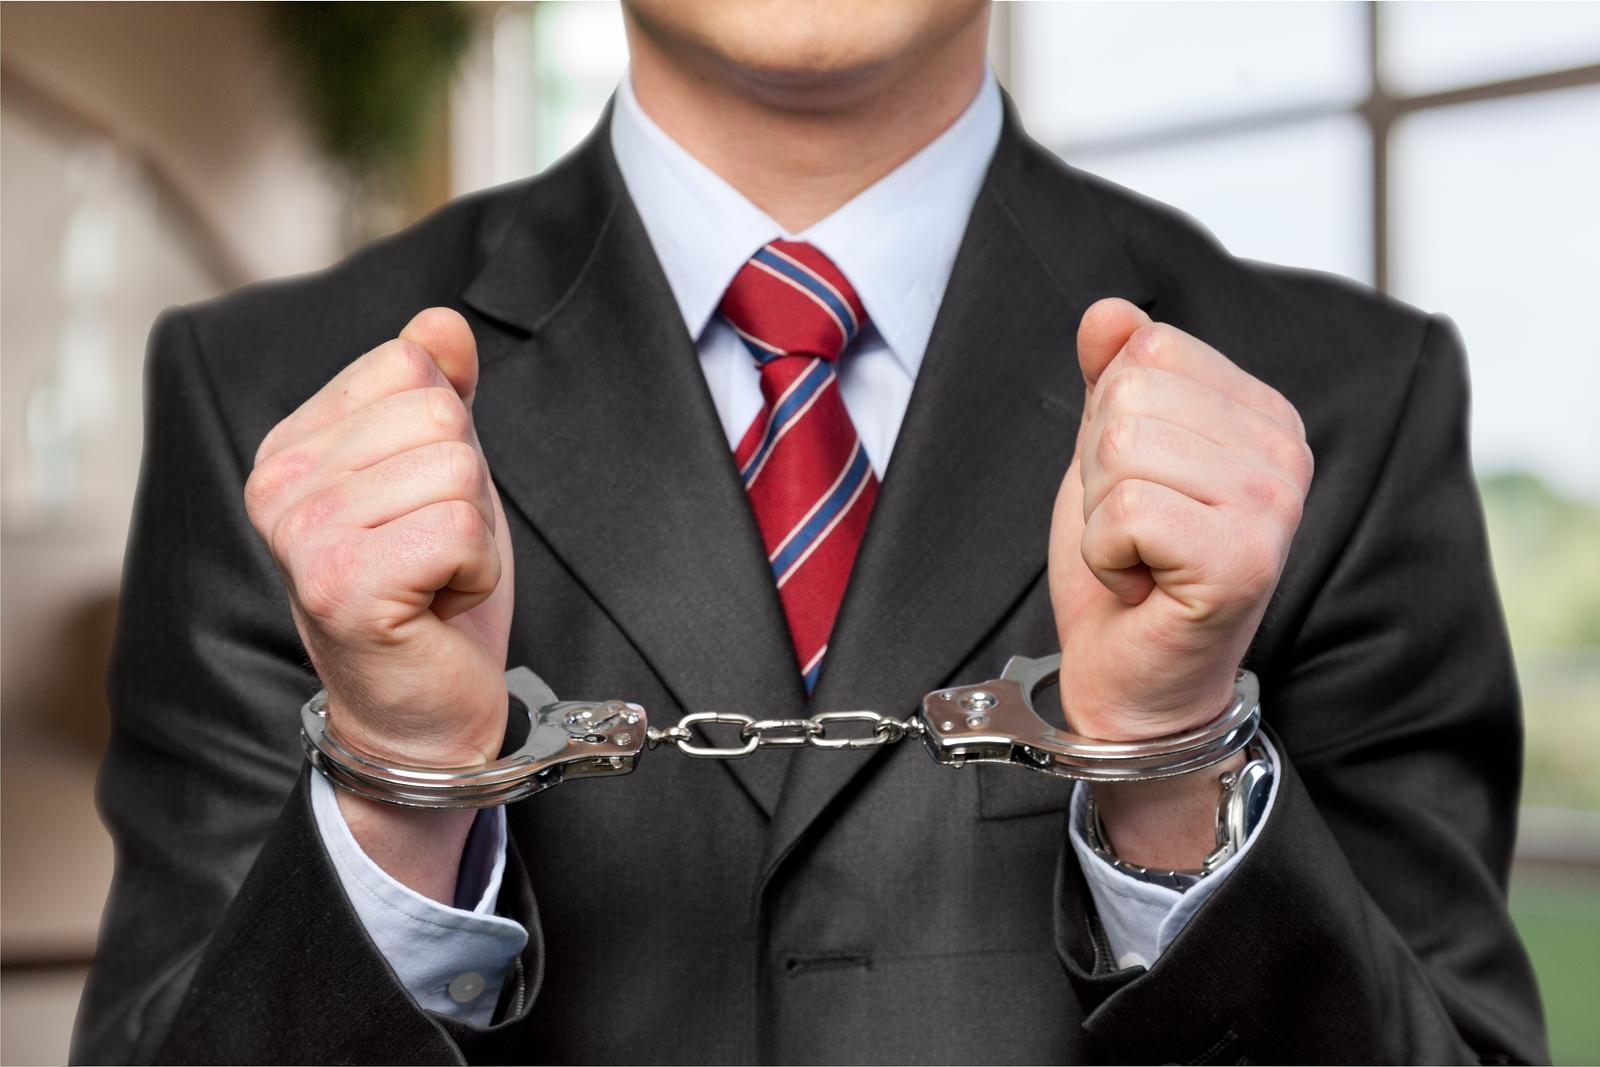 white-collar-crime-office-document-company.jpg